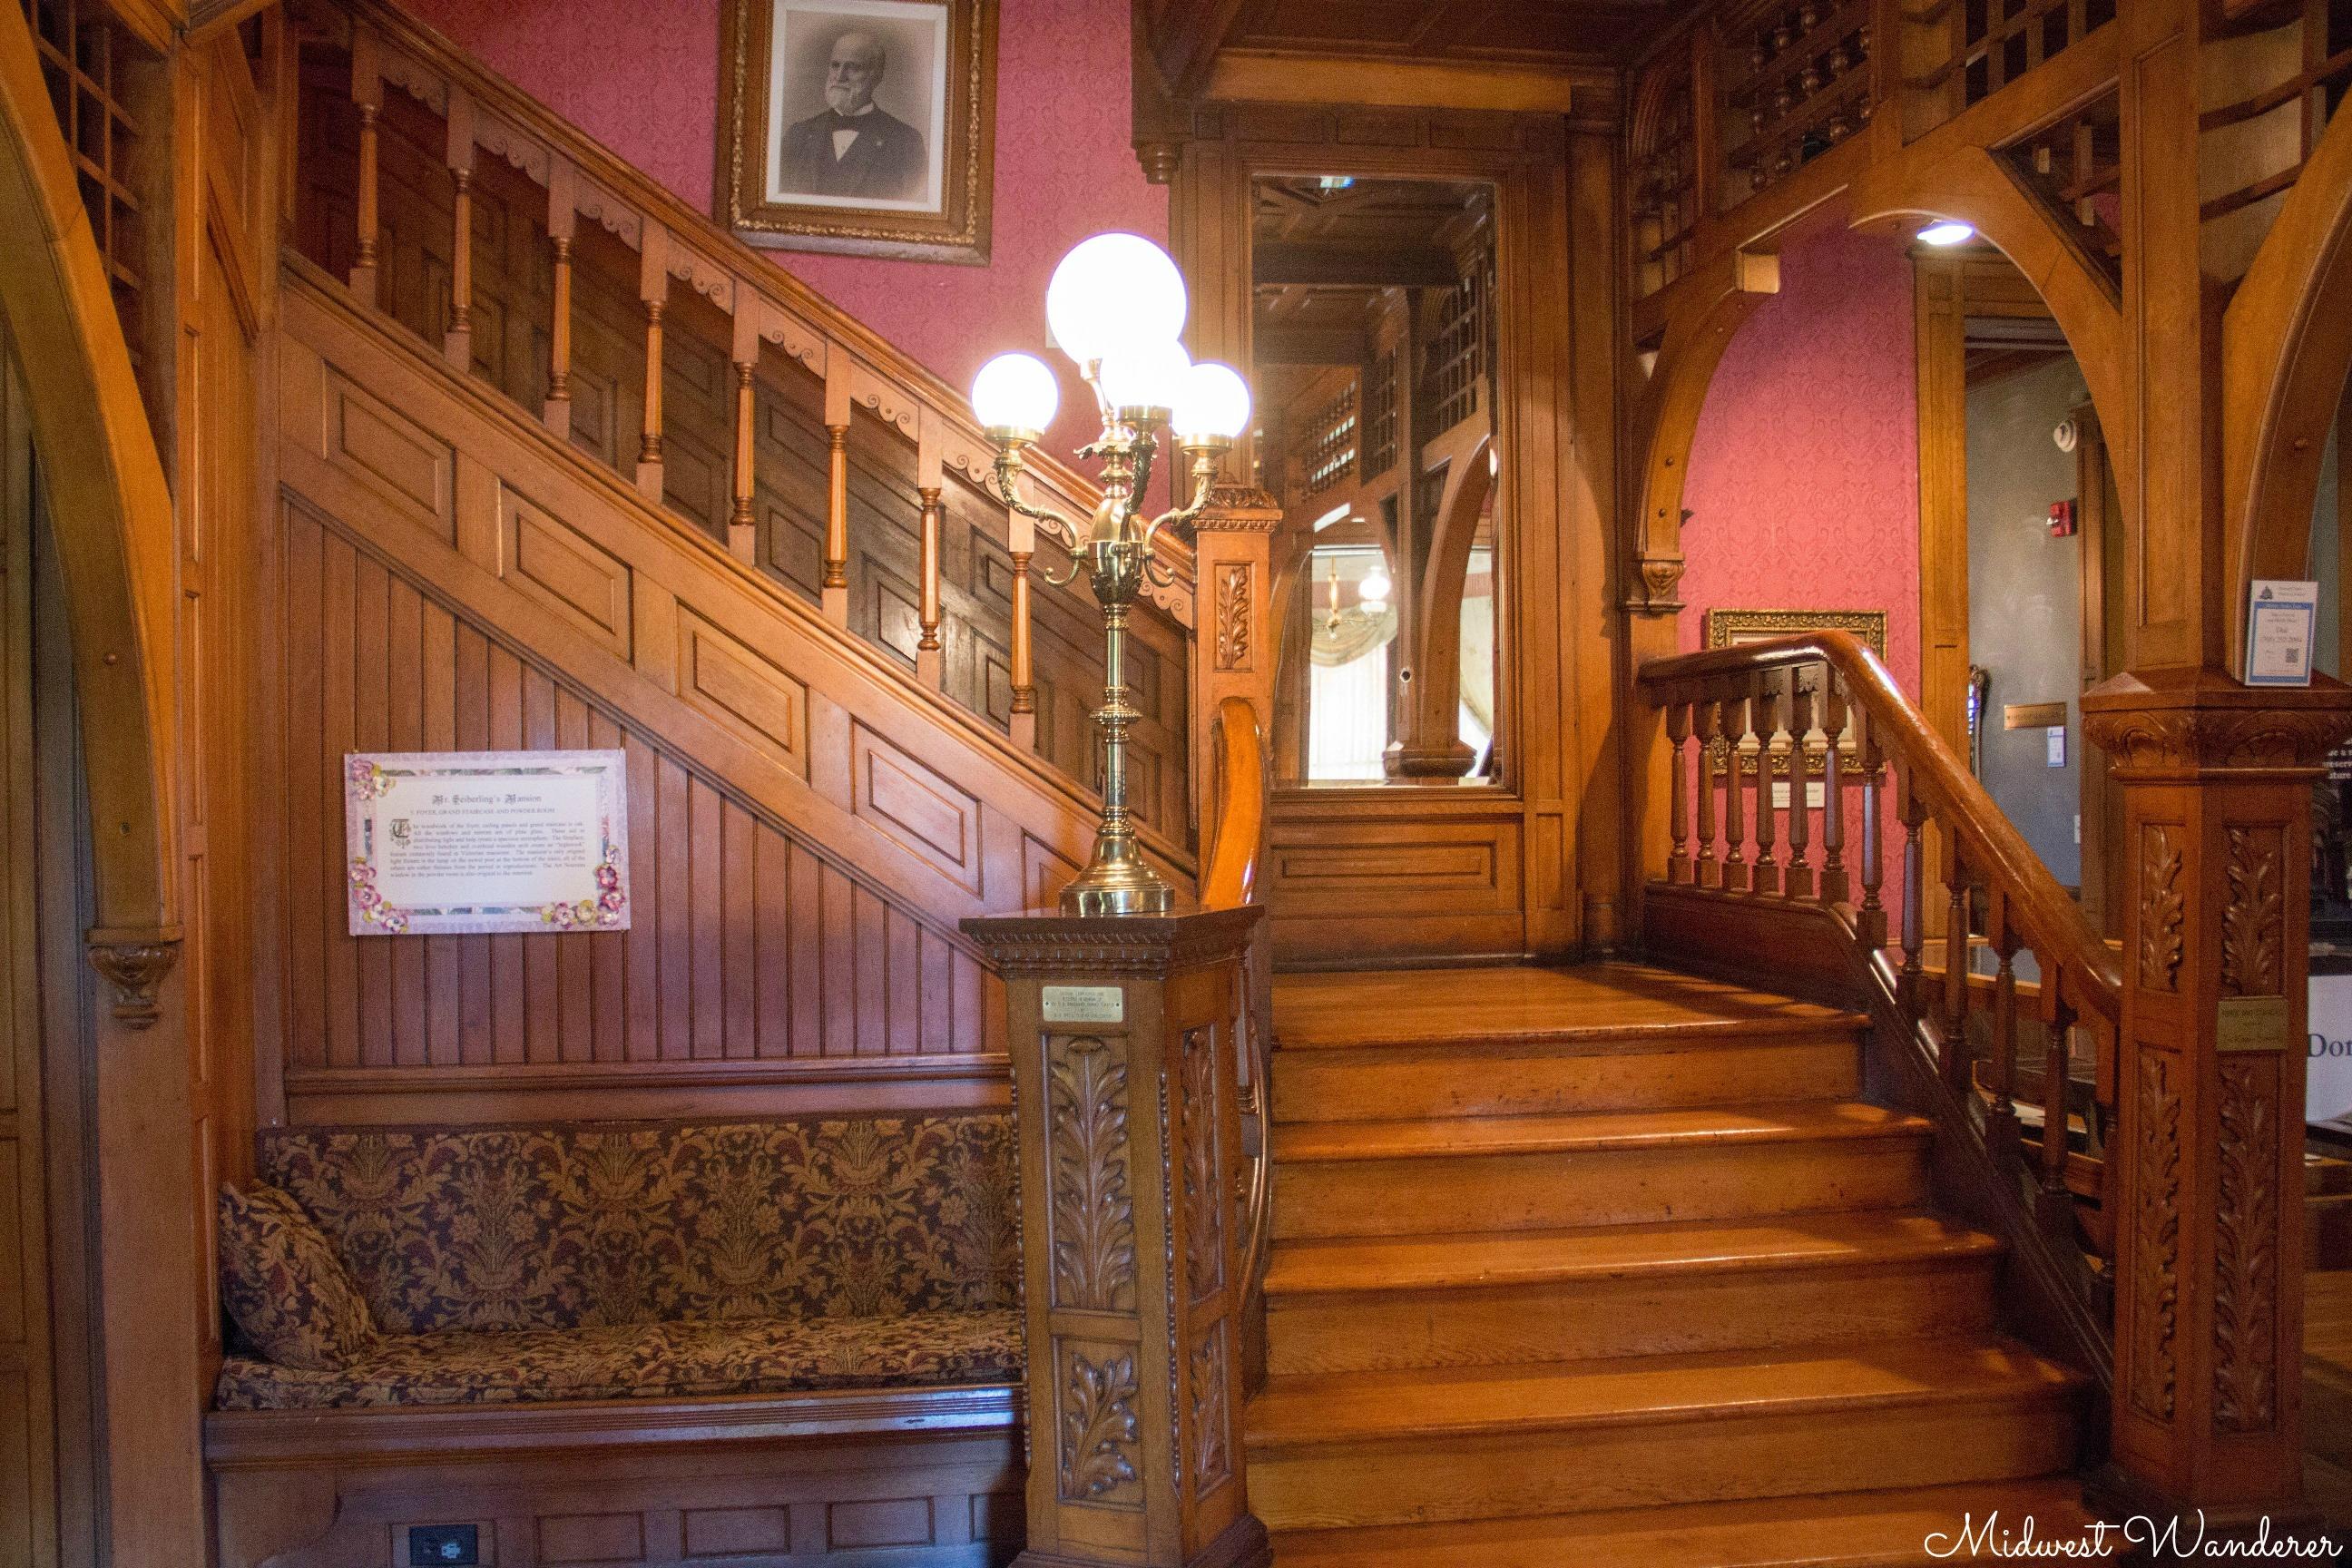 riginal Light Fixture in Seiberling Mansion